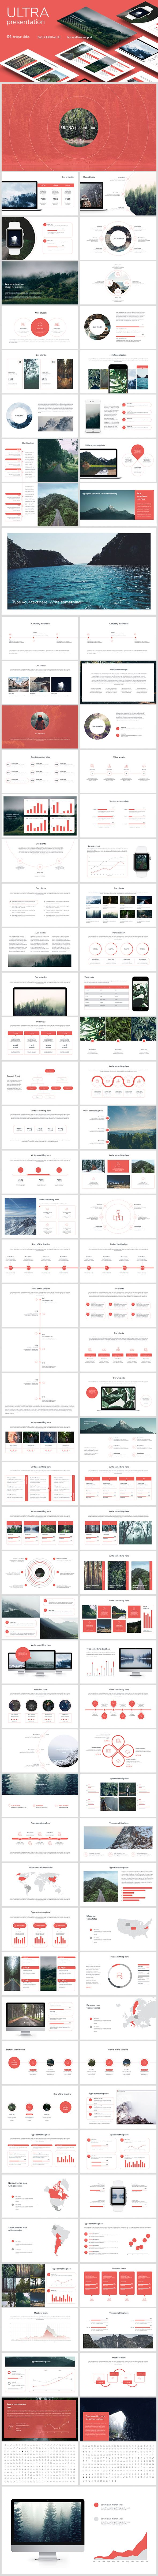 Ultra clean presentation - Keynote Templates Presentation Templates